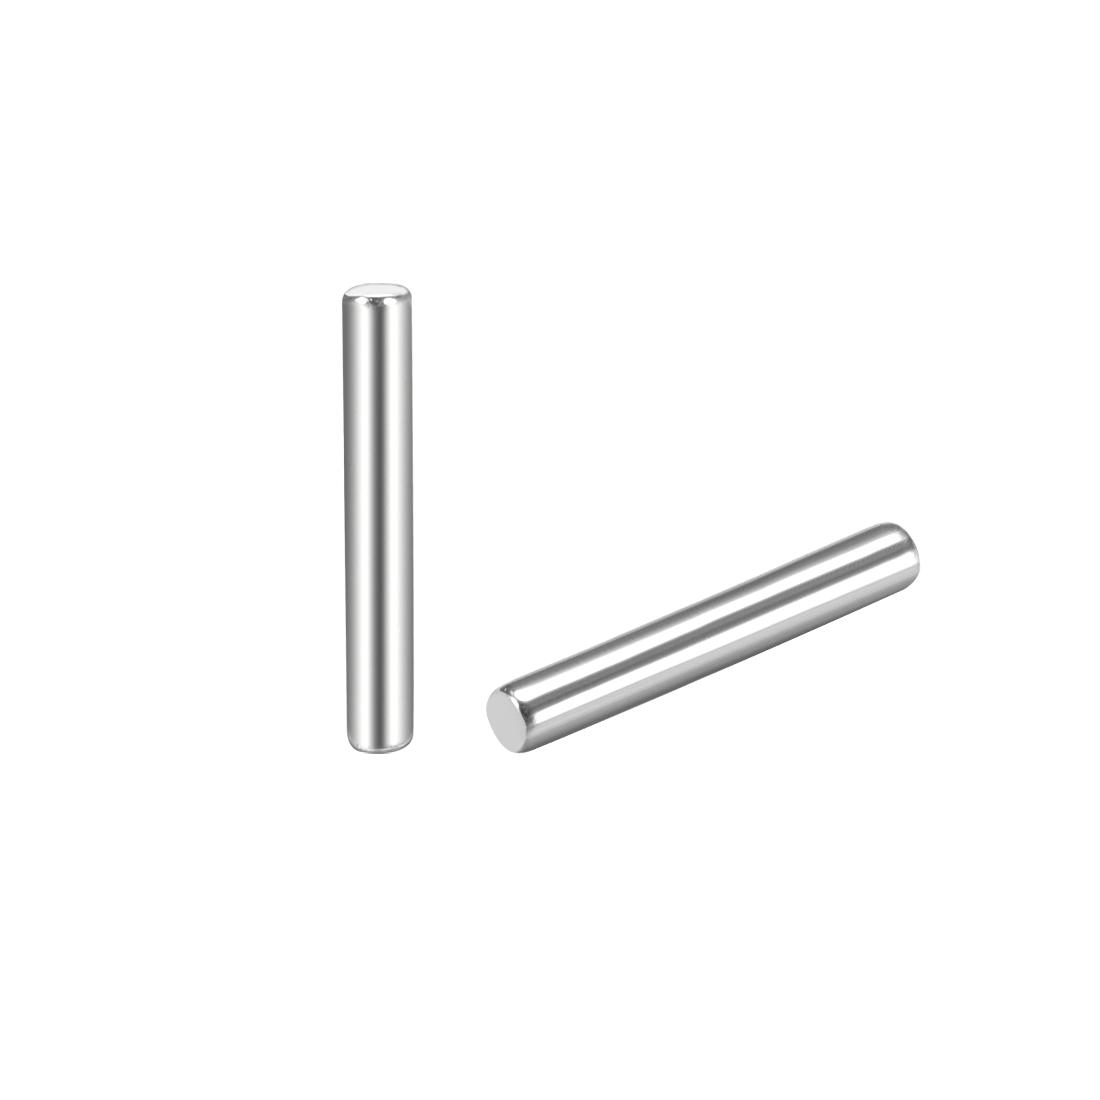 15Pcs 1.5mm x 10mm Dowel Pin 304 Stainless Steel Shelf Support Pin Fasten